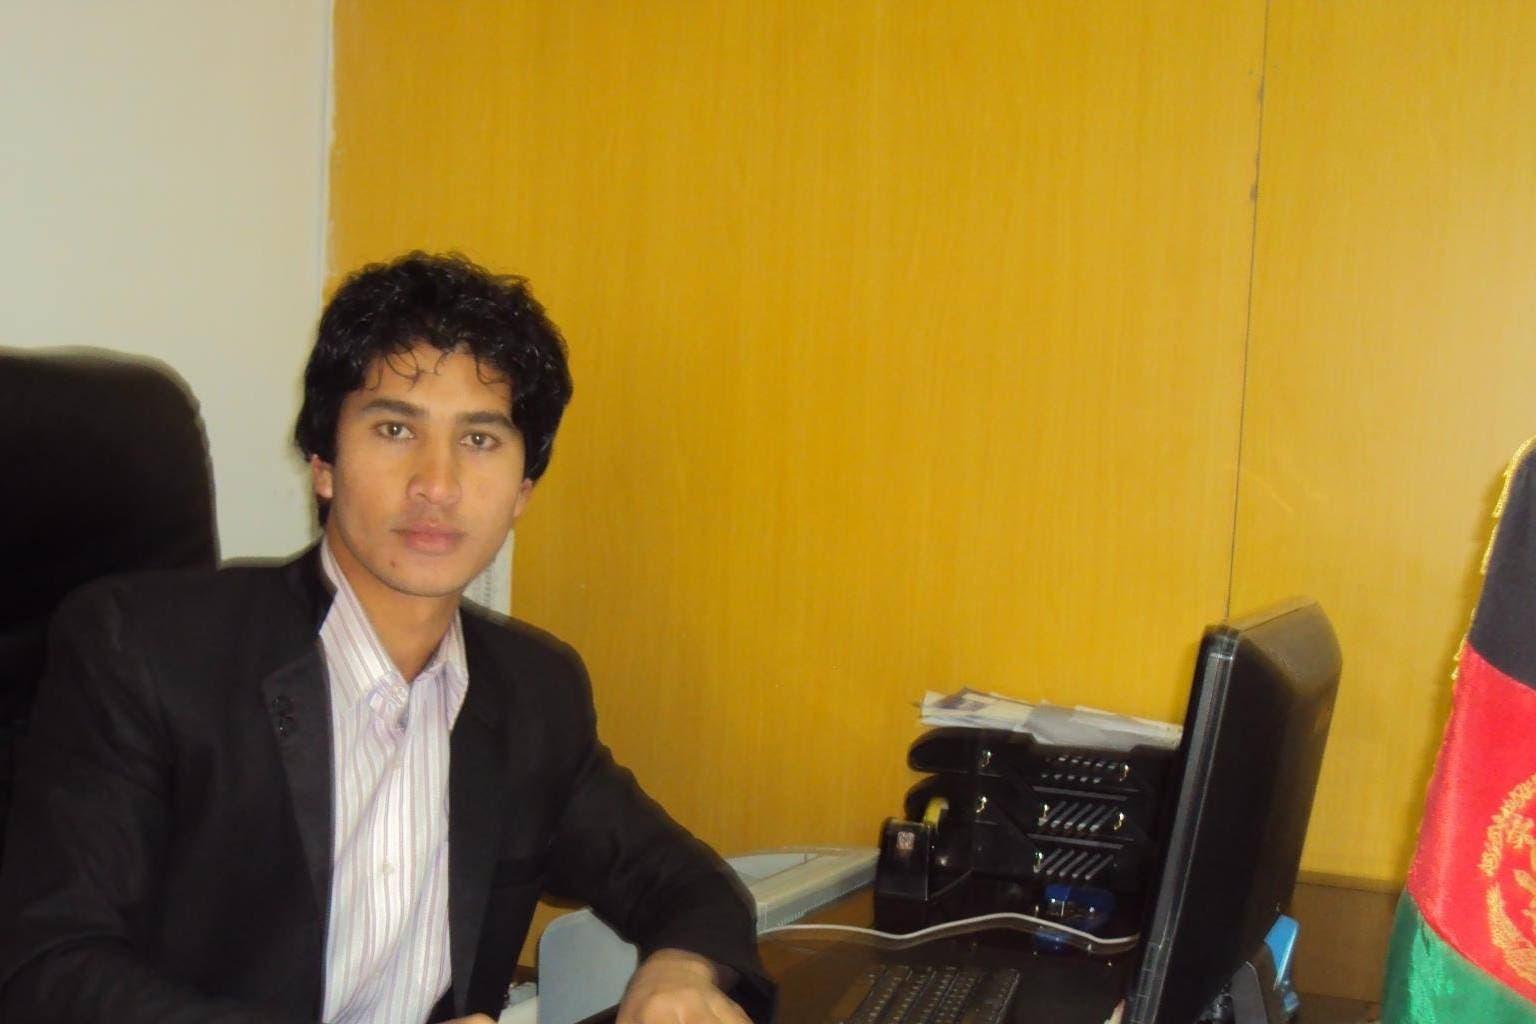 عبدالبصیر کارمندی که در حمله مسلحانه کشته شد